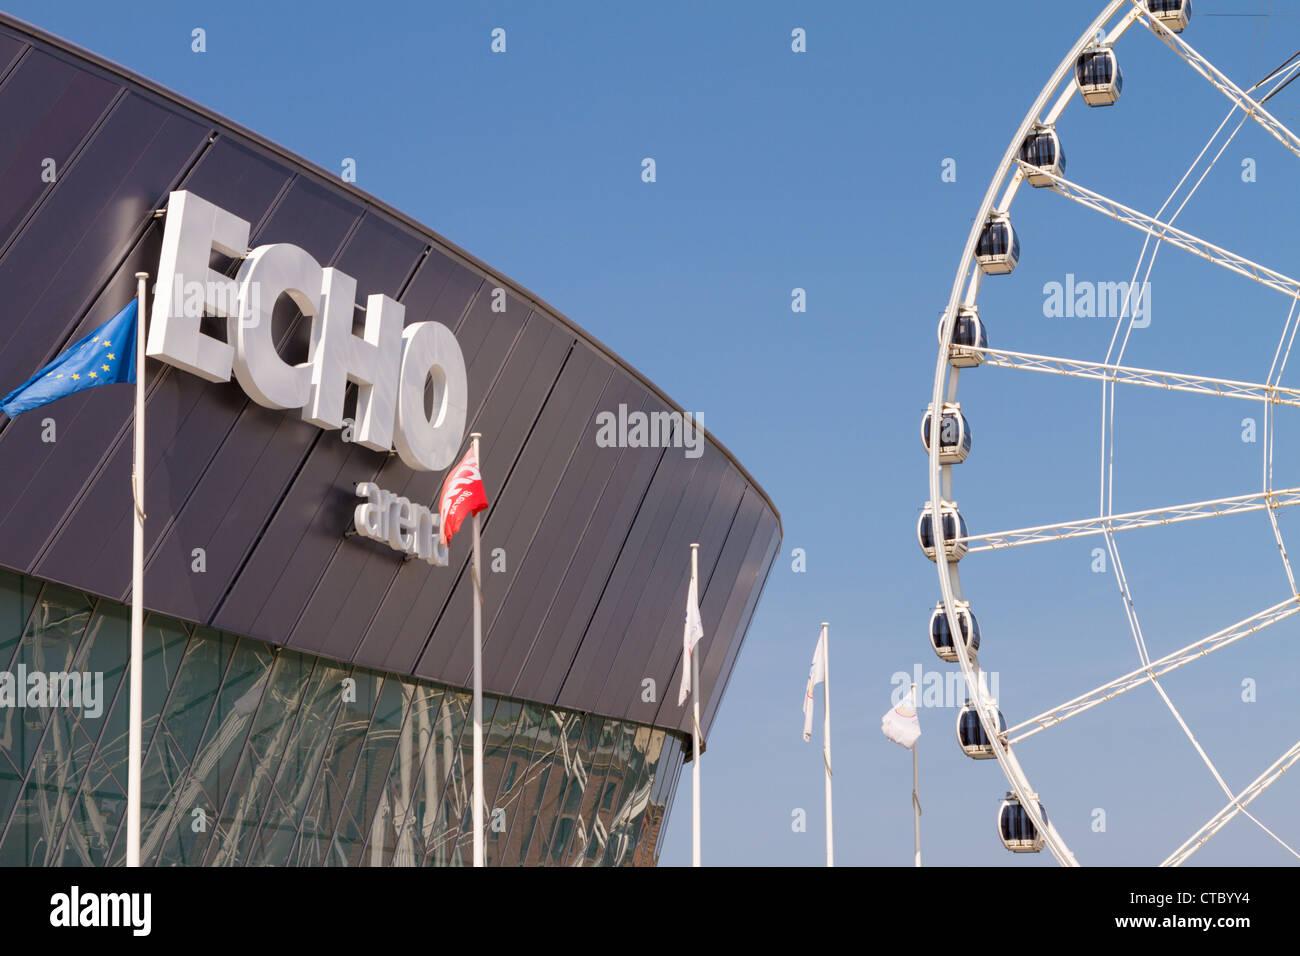 The Echo Wheel of Liverpool - Stock Image